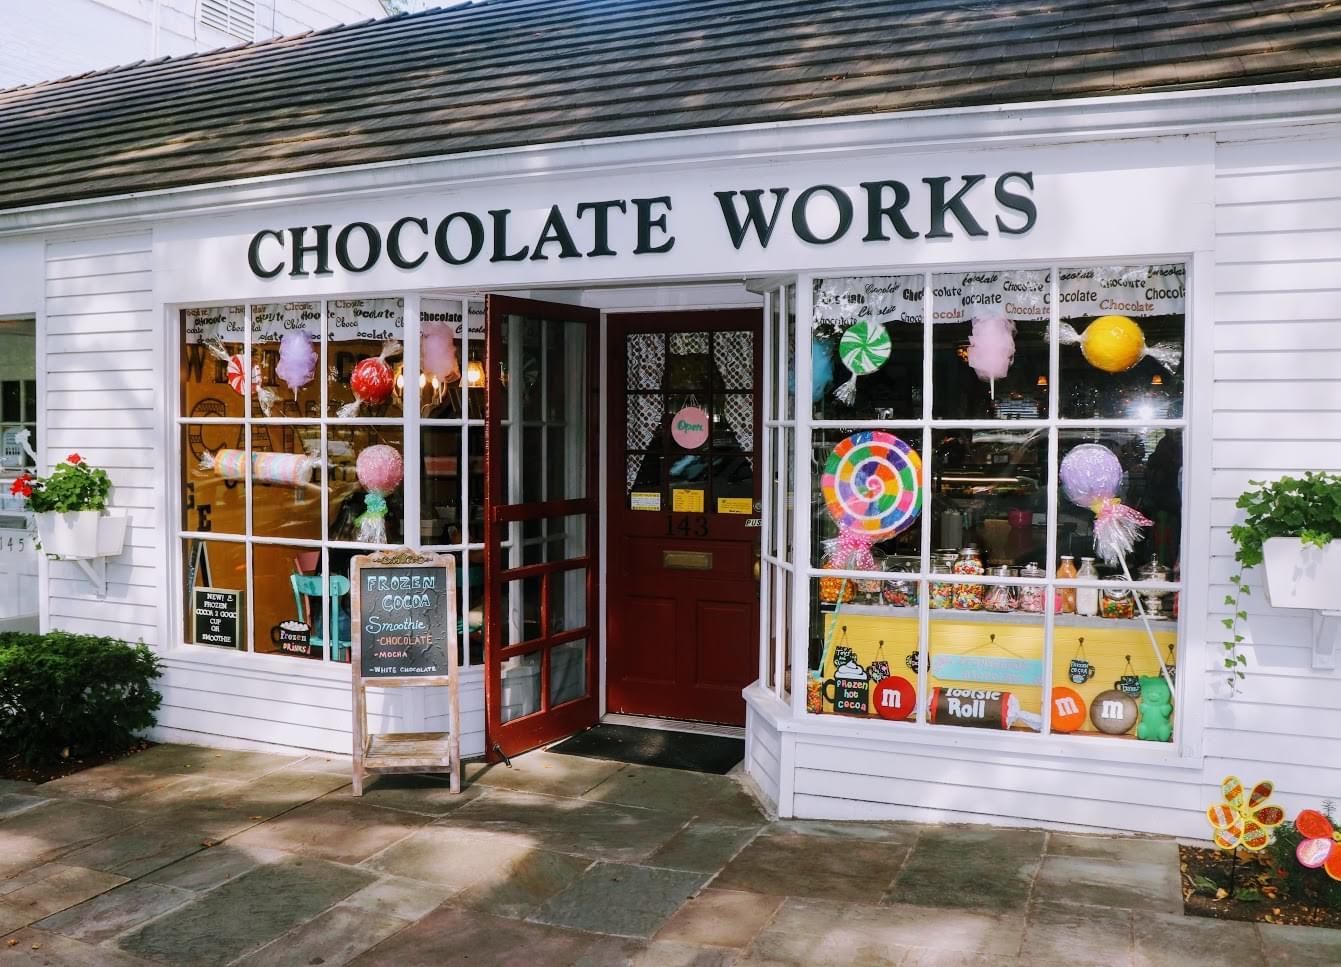 Anna's Wish List – Chocolate Works